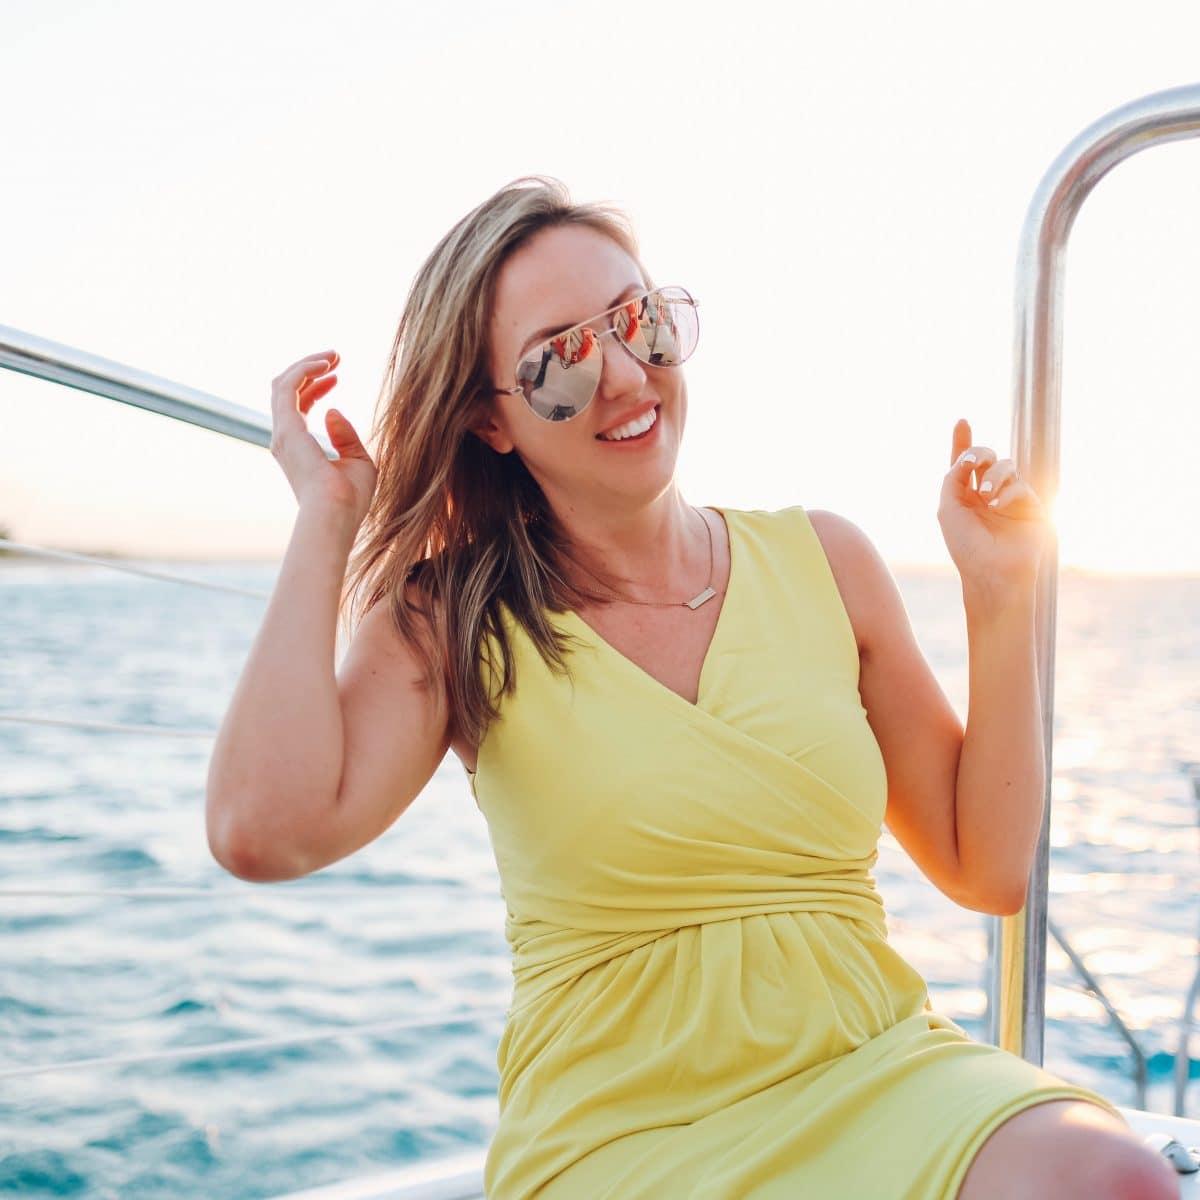 Kitty Katt Catamaran at Beaches Turks and Caicos - travel guide by Houston blogger Meg O. on the Go